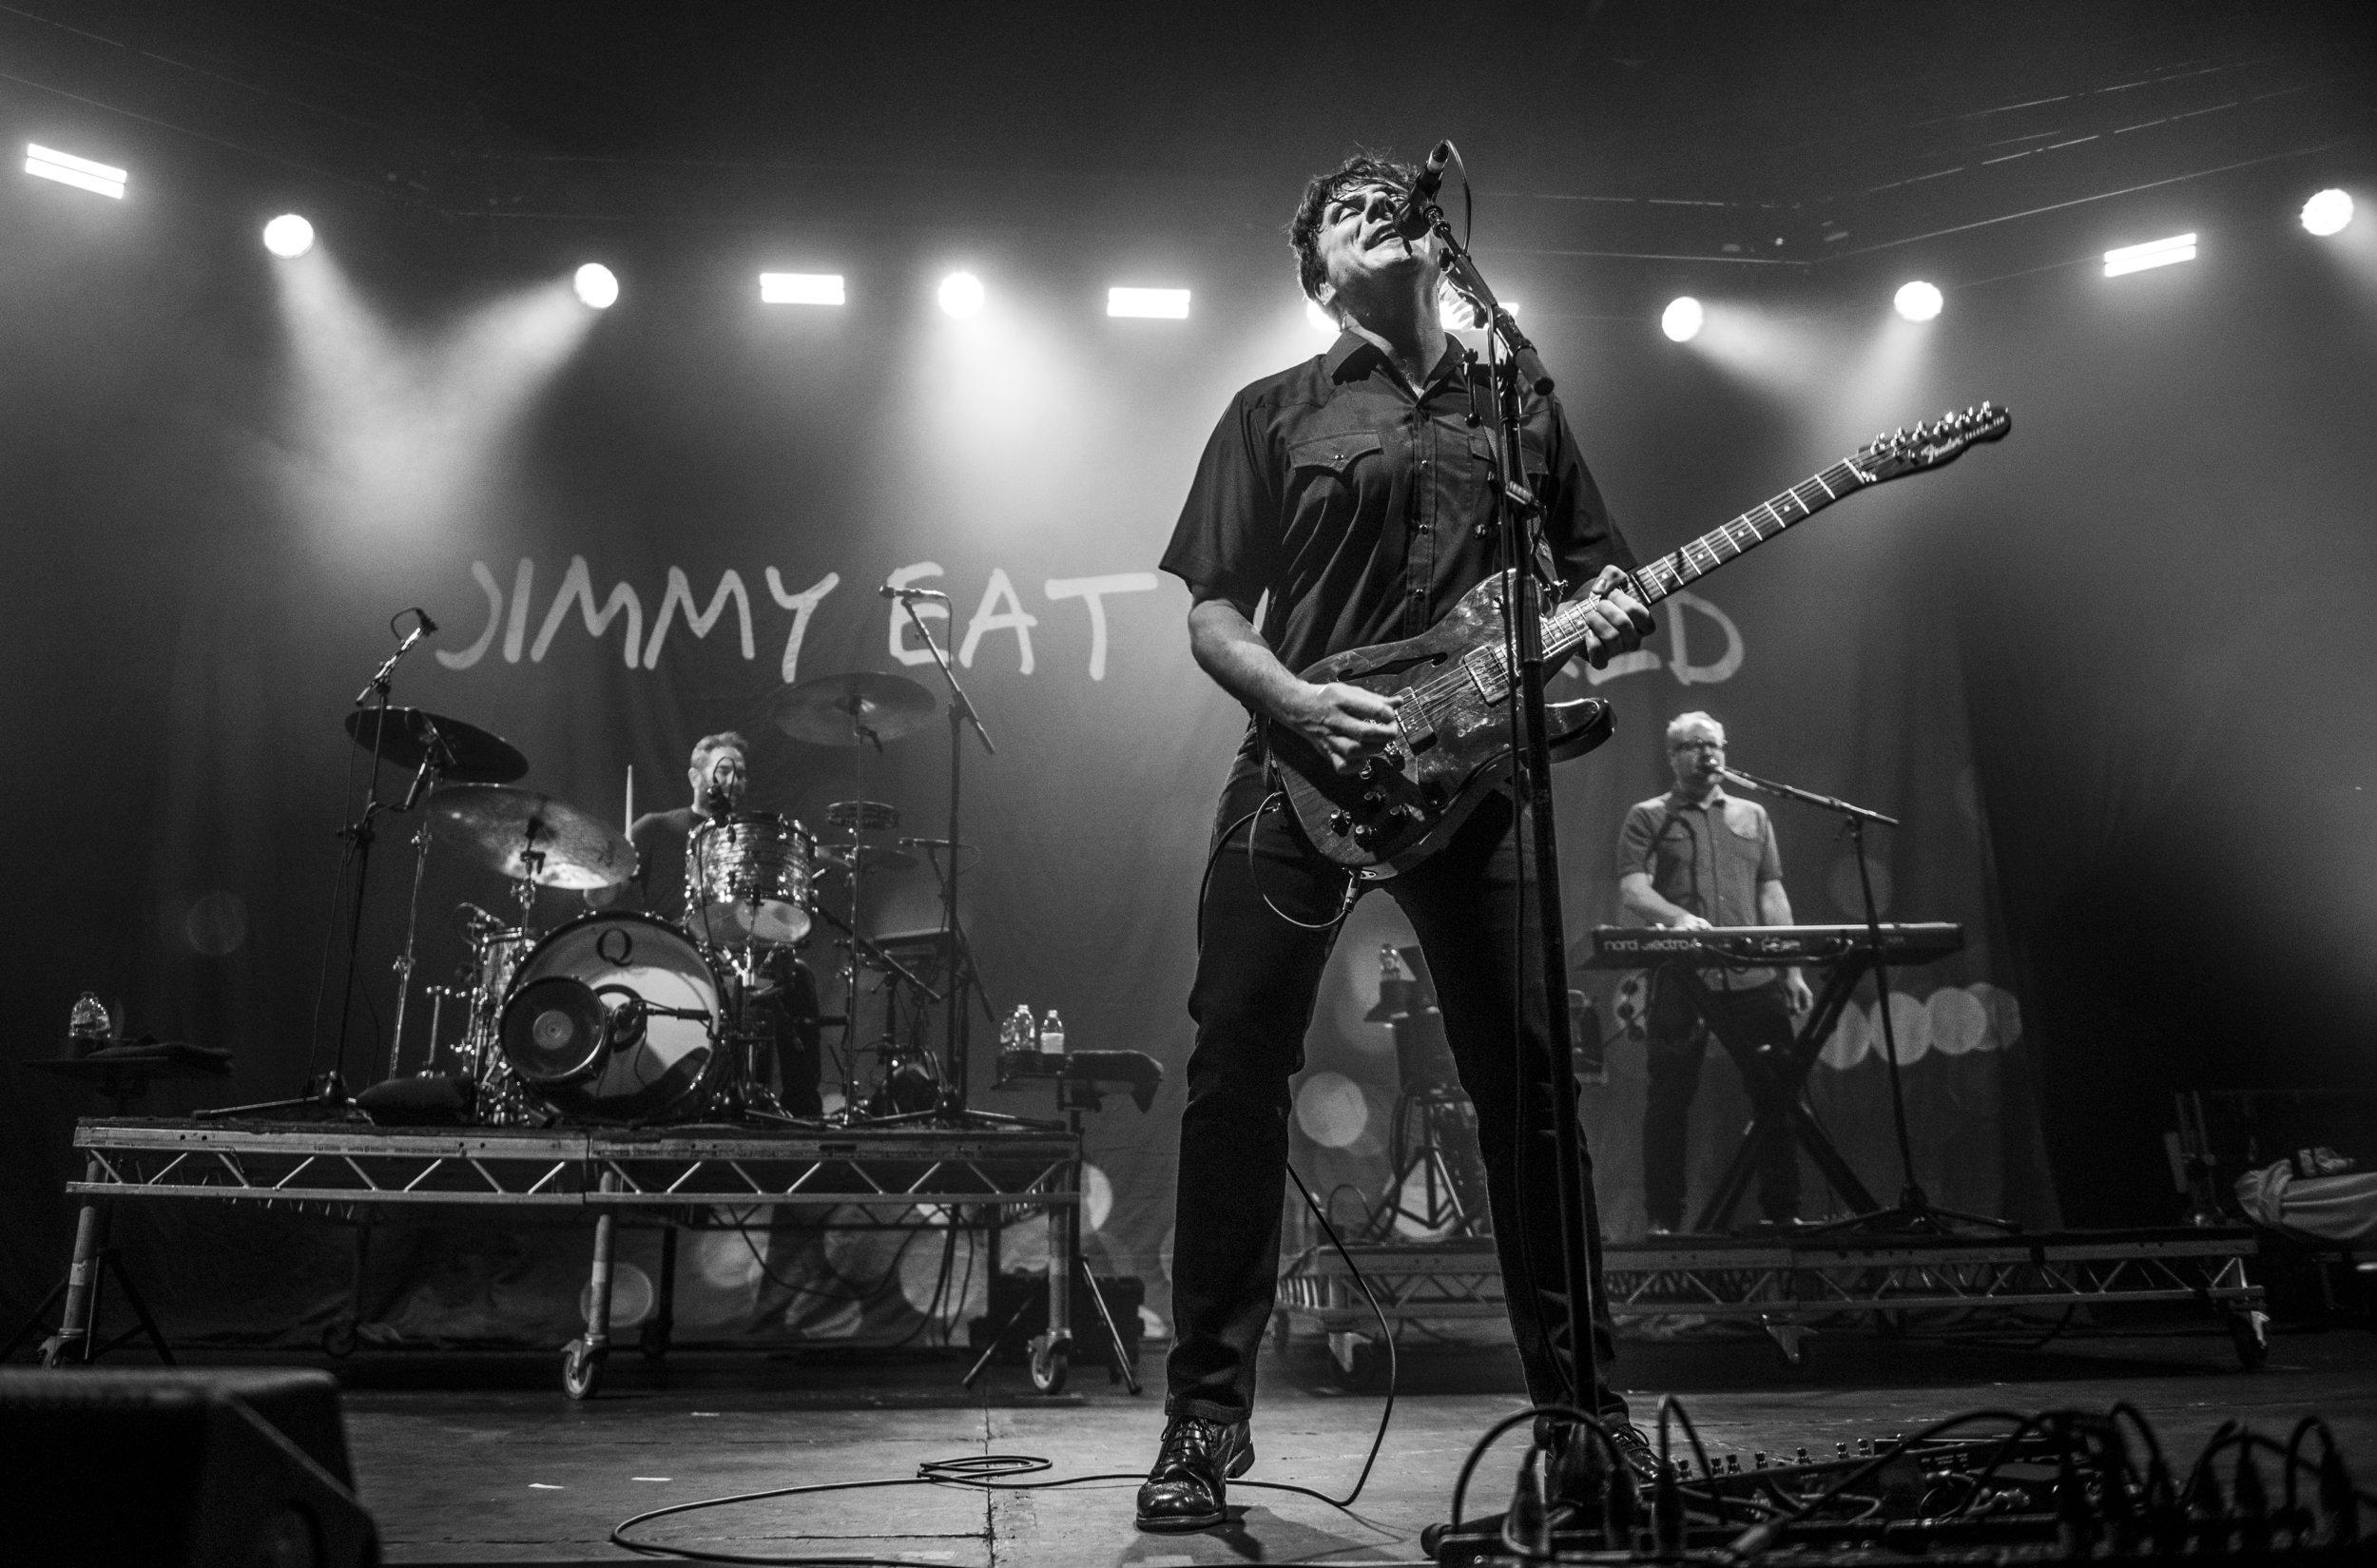 Jimmy Eat World - @ Victoria Warehouse, Manchester 26.01.2019